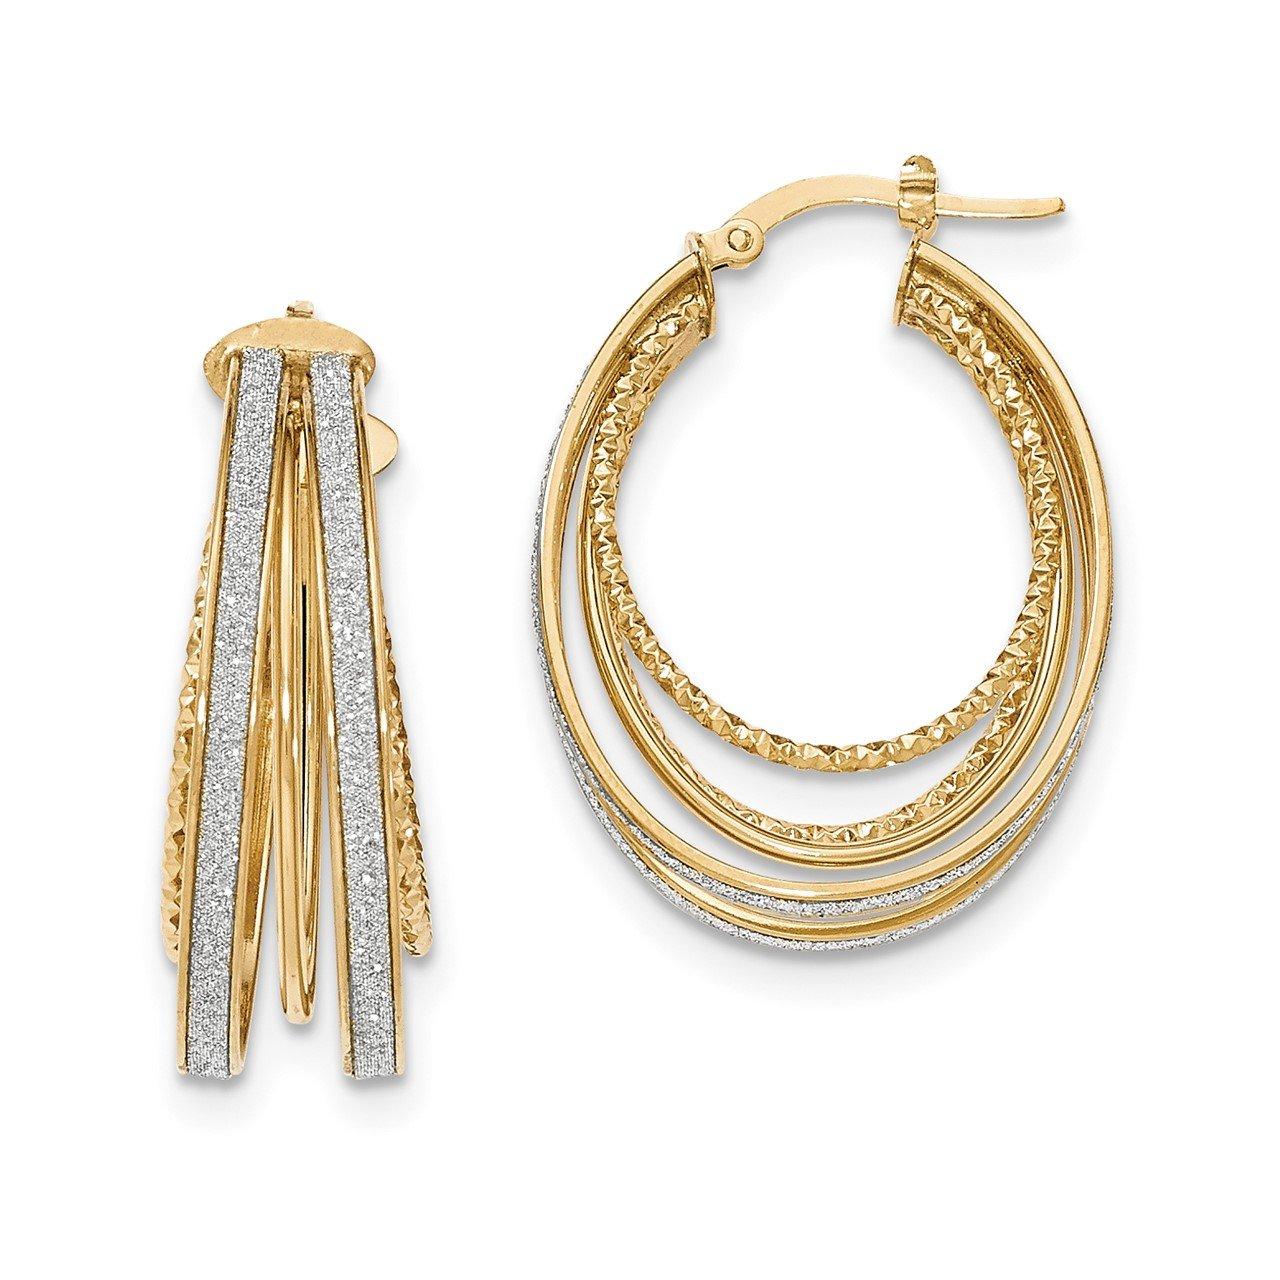 14k Polished Glitter Infused Large Oval Hoop Earrings